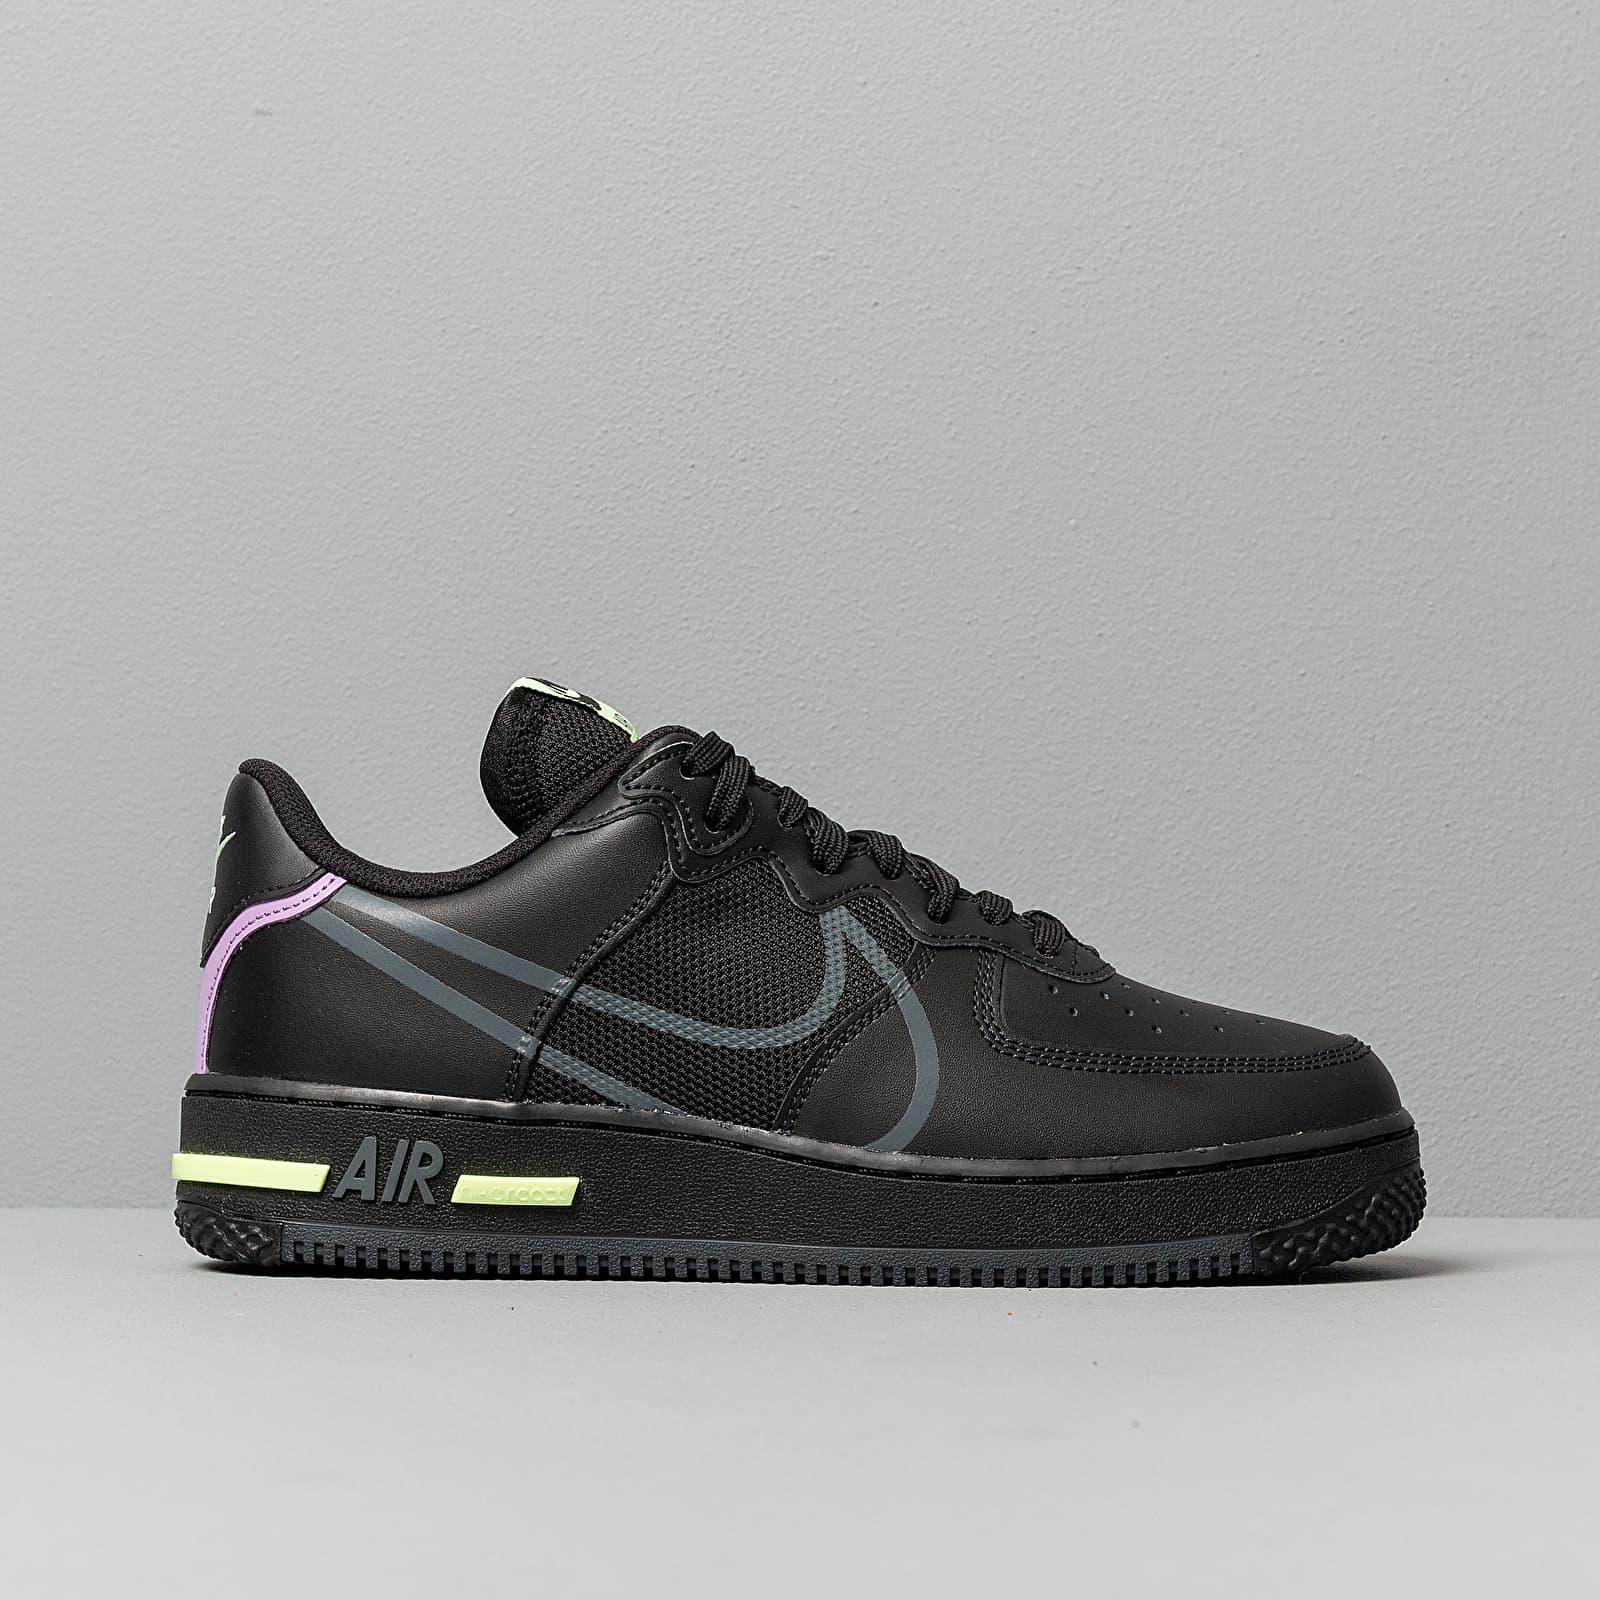 Nike Air Force 1 React Black Anthracite Violet Star Barely Volt